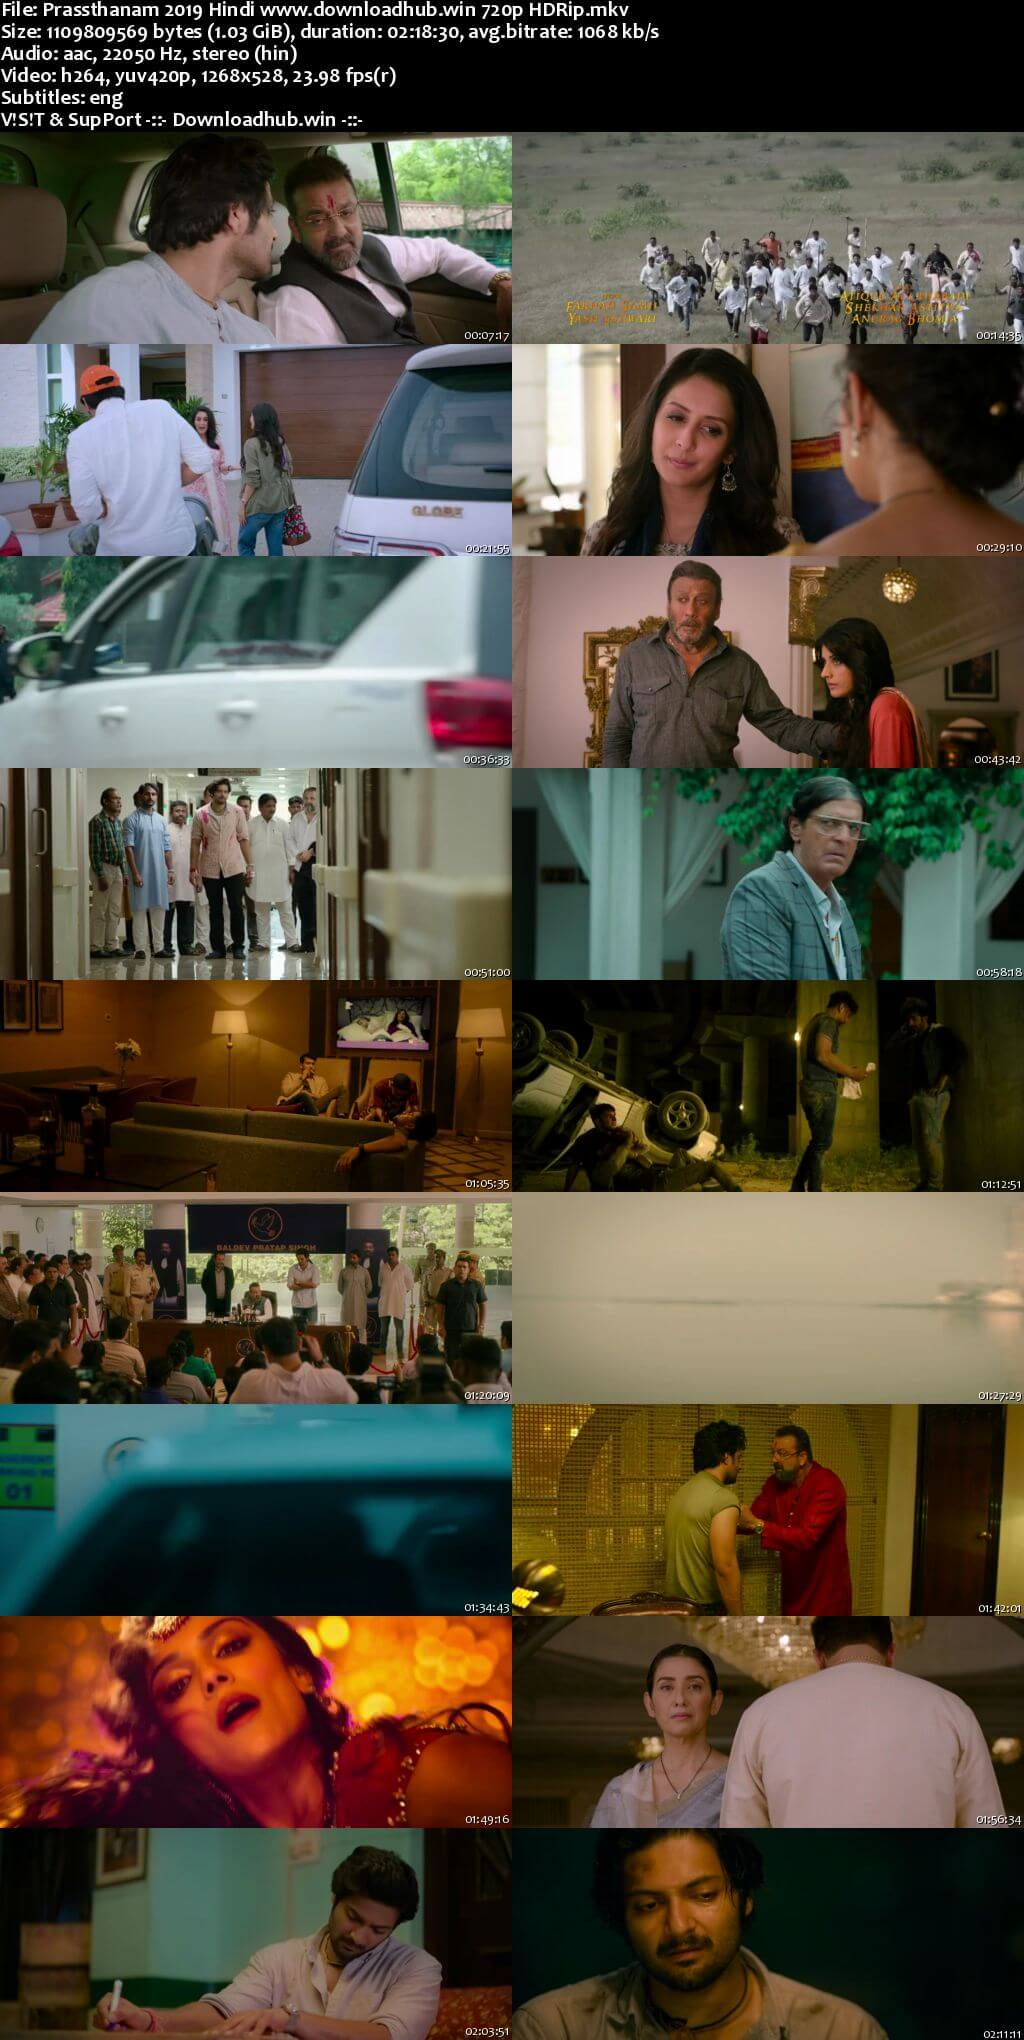 Prassthanam 2019 Hindi 720p HDRip ESubs